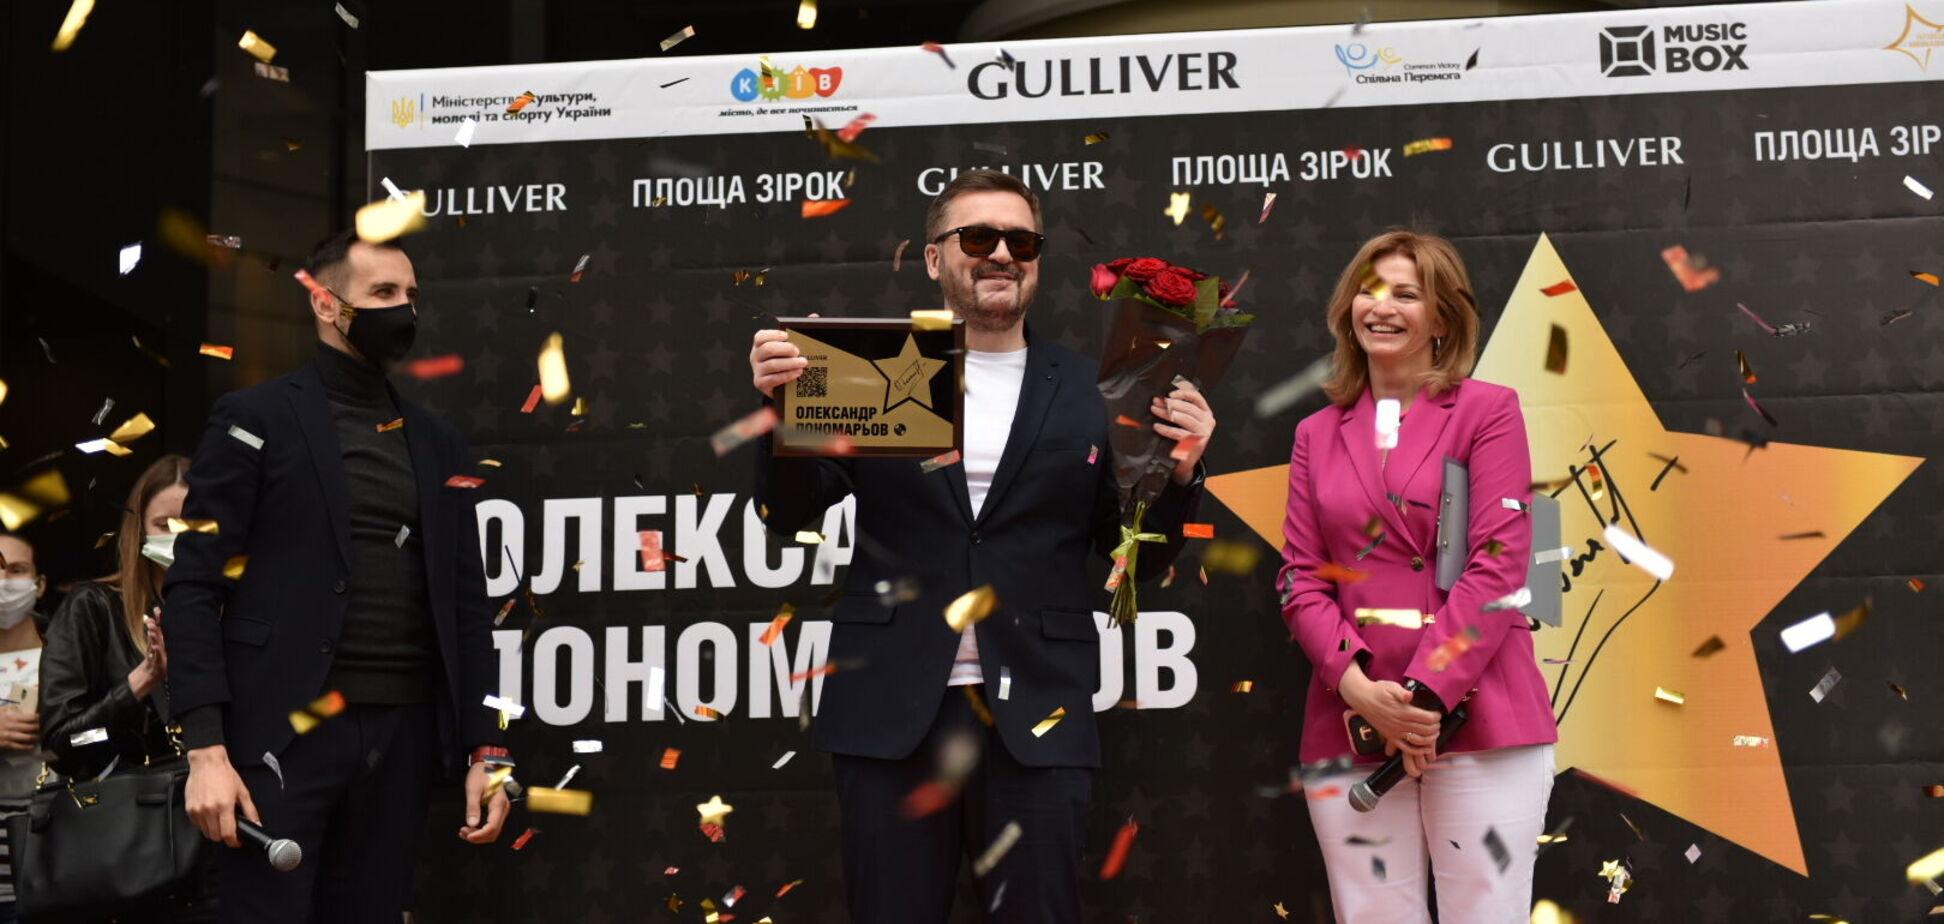 14 мая на 'Площади Звезд' открыли звезду Пономарева